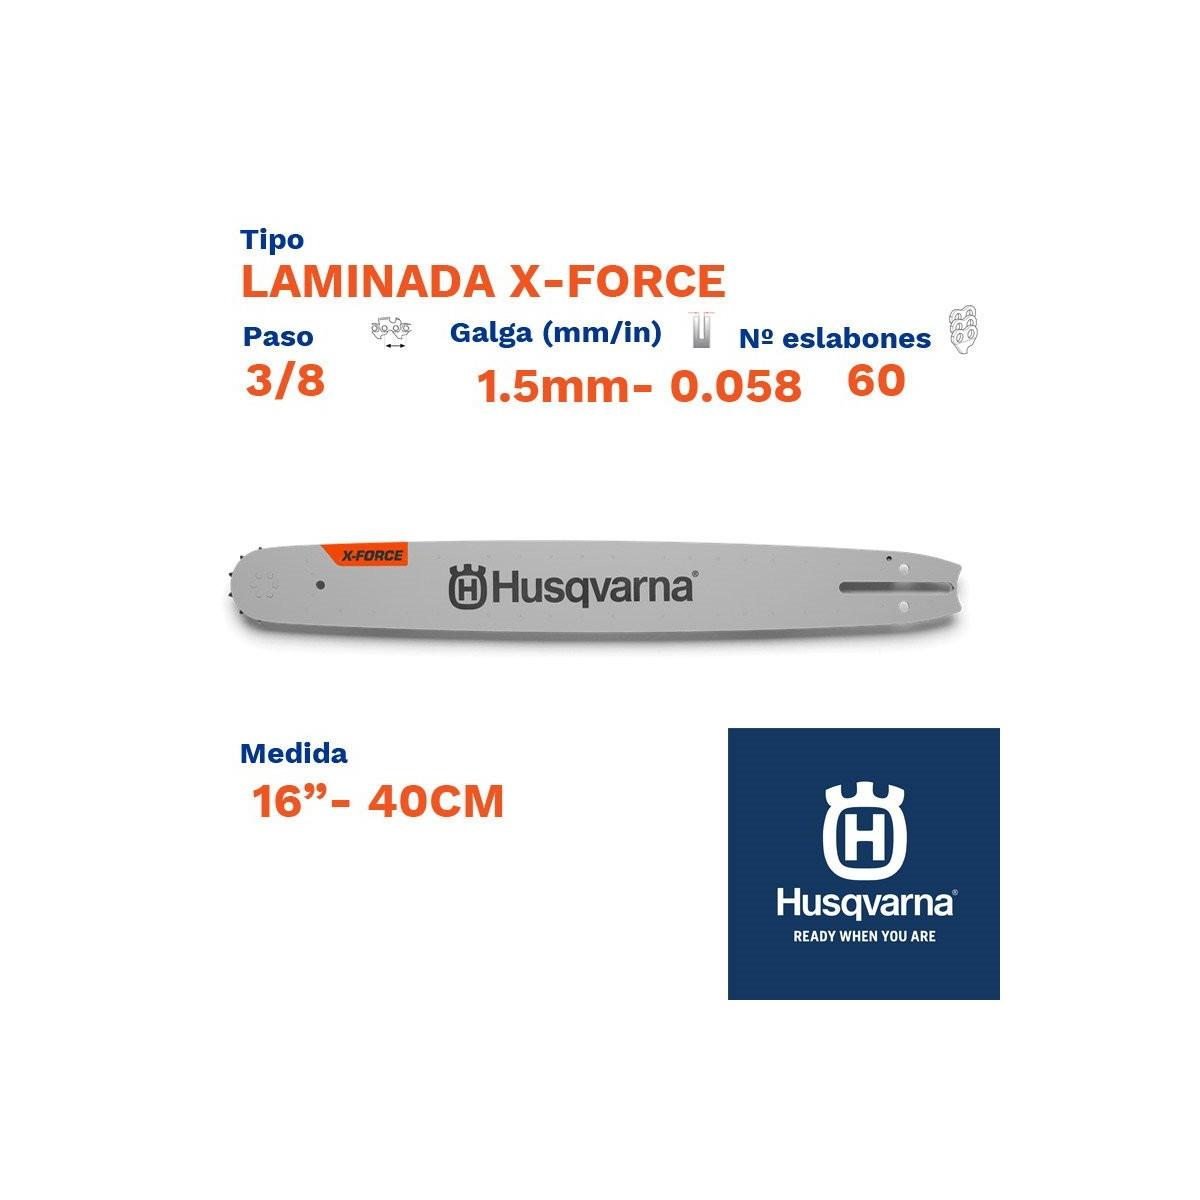 "Husqvarna espada laminada x-force 1.5mm 60 eslabones-pc 3/8   16""- 40cm"